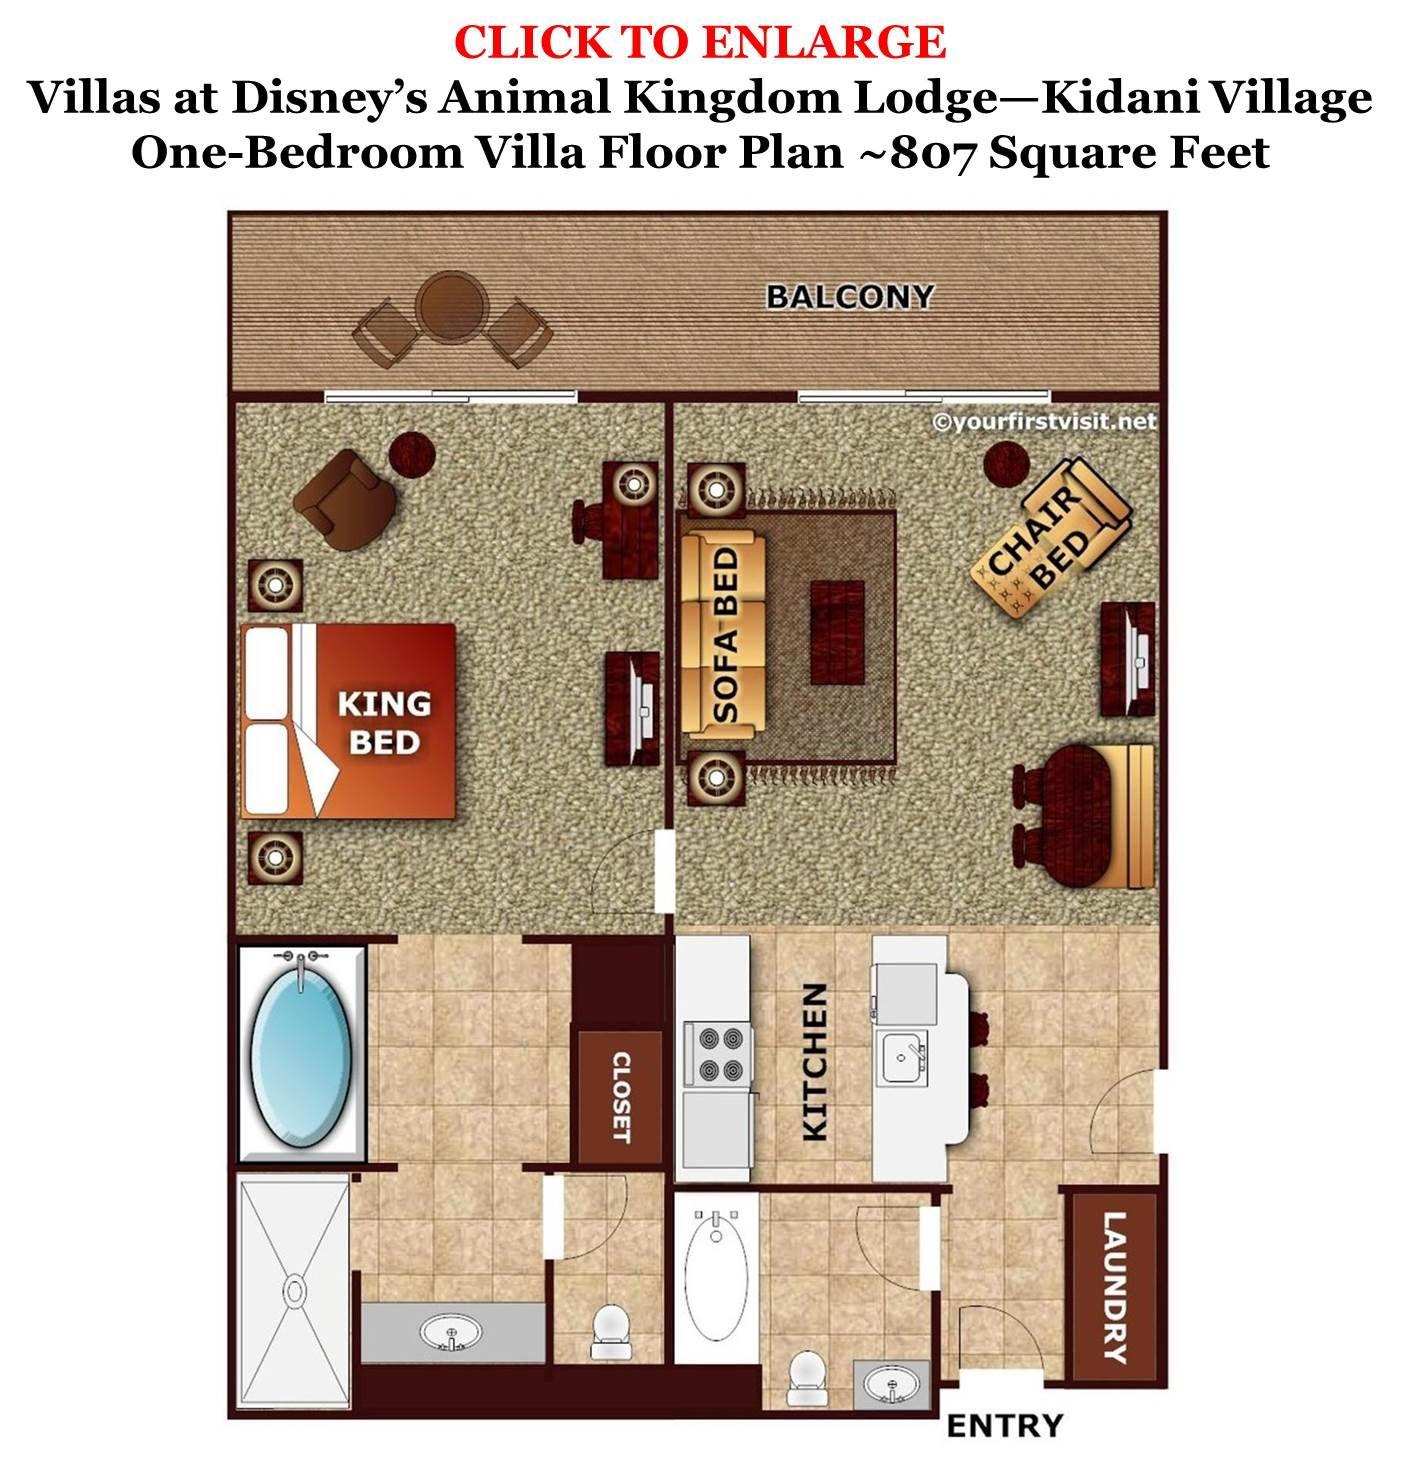 Review kidani village at disney s animal kingdom villas - Bay lake tower 2 bedroom villa floor plan ...